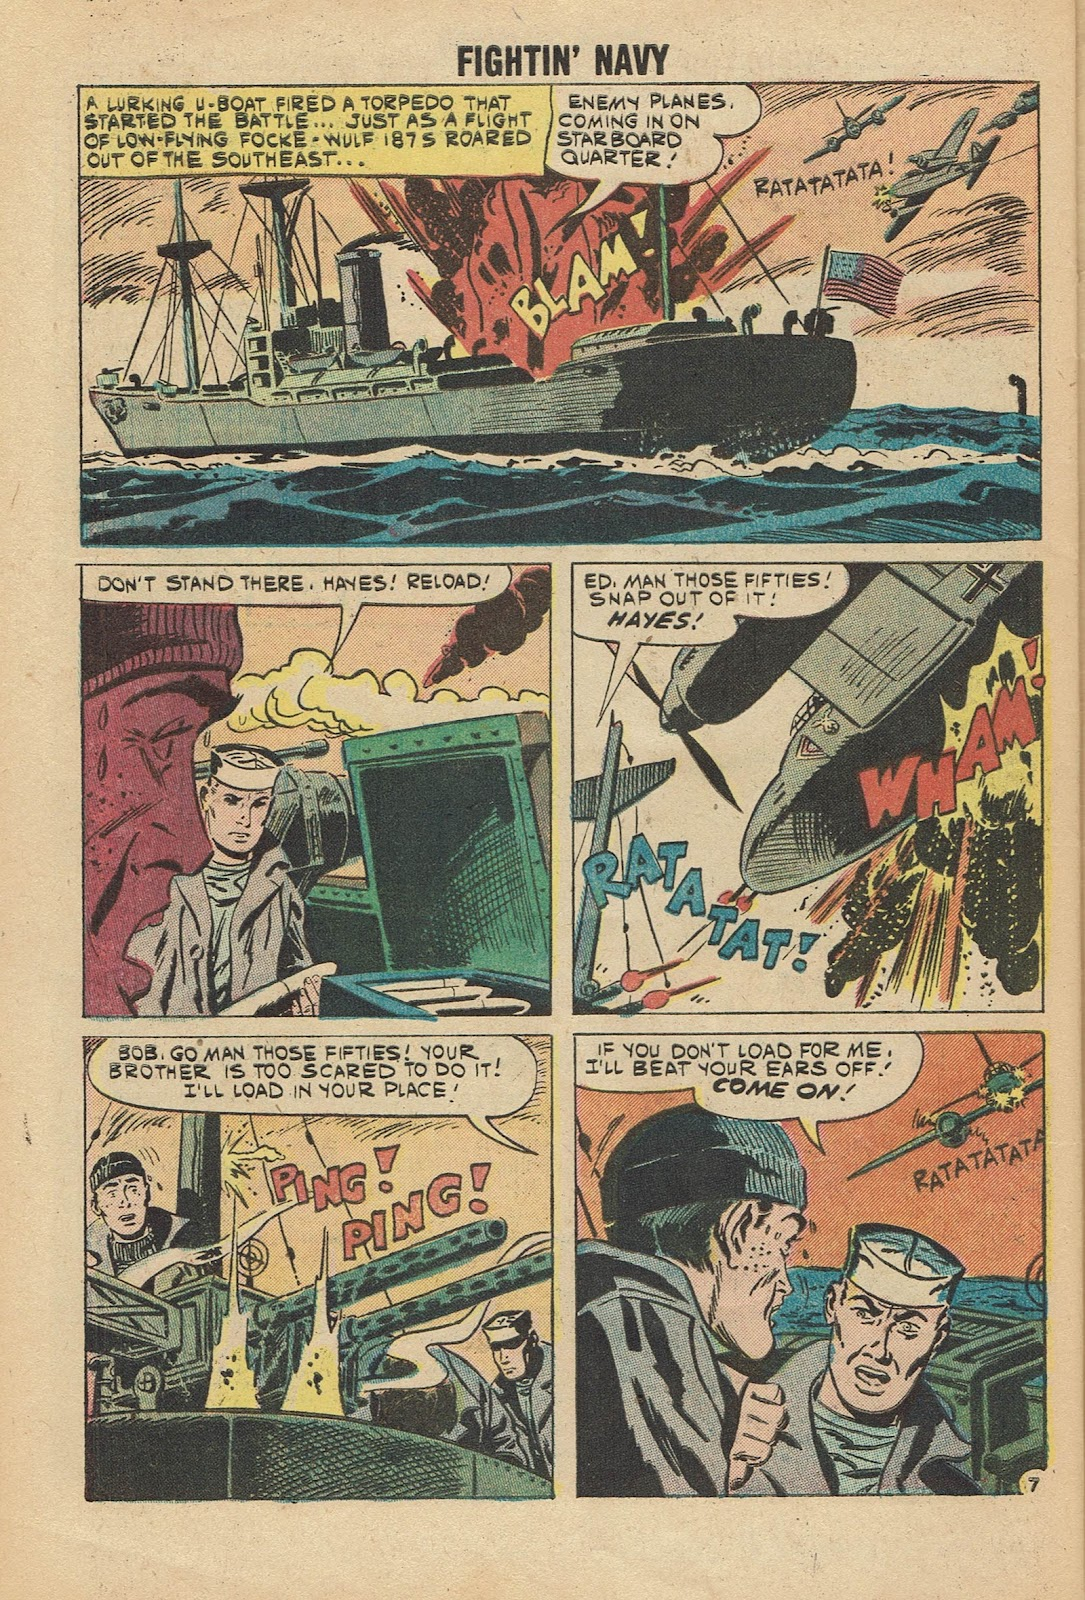 Read online Fightin' Navy comic -  Issue #96 - 32